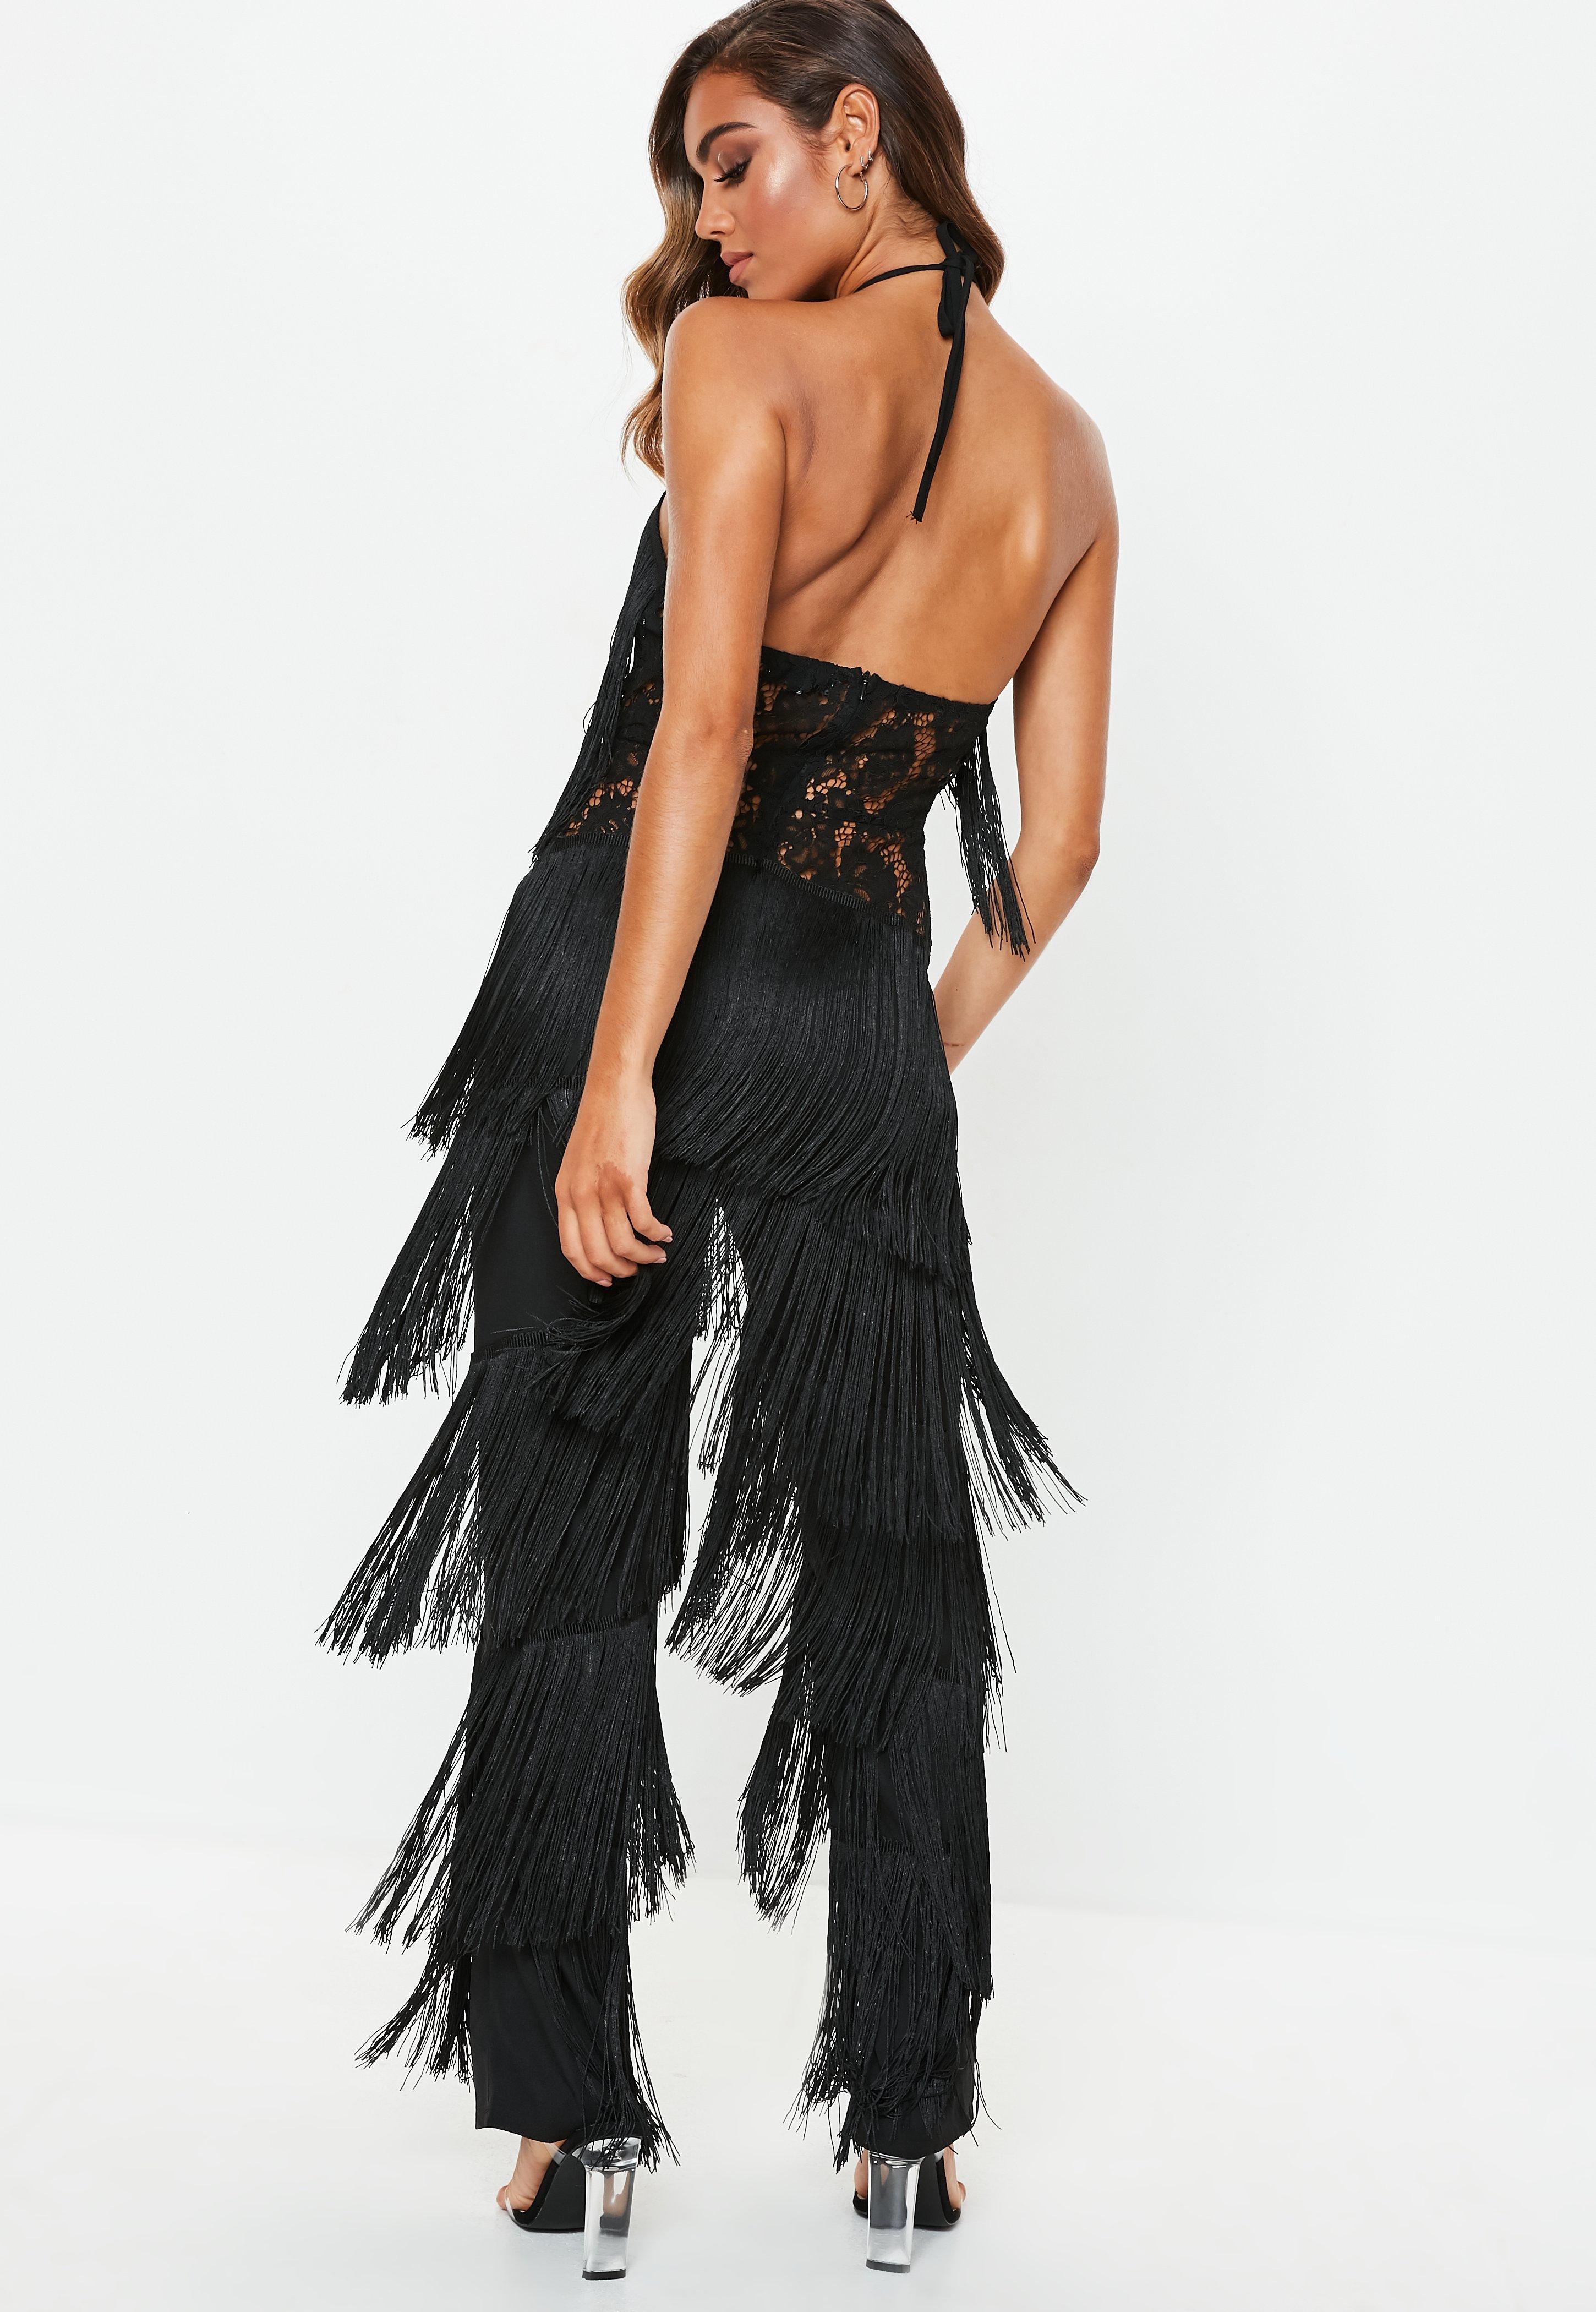 eaedd92a32c Missguided - Black Fringe Lace Jumpsuit - Lyst. View fullscreen